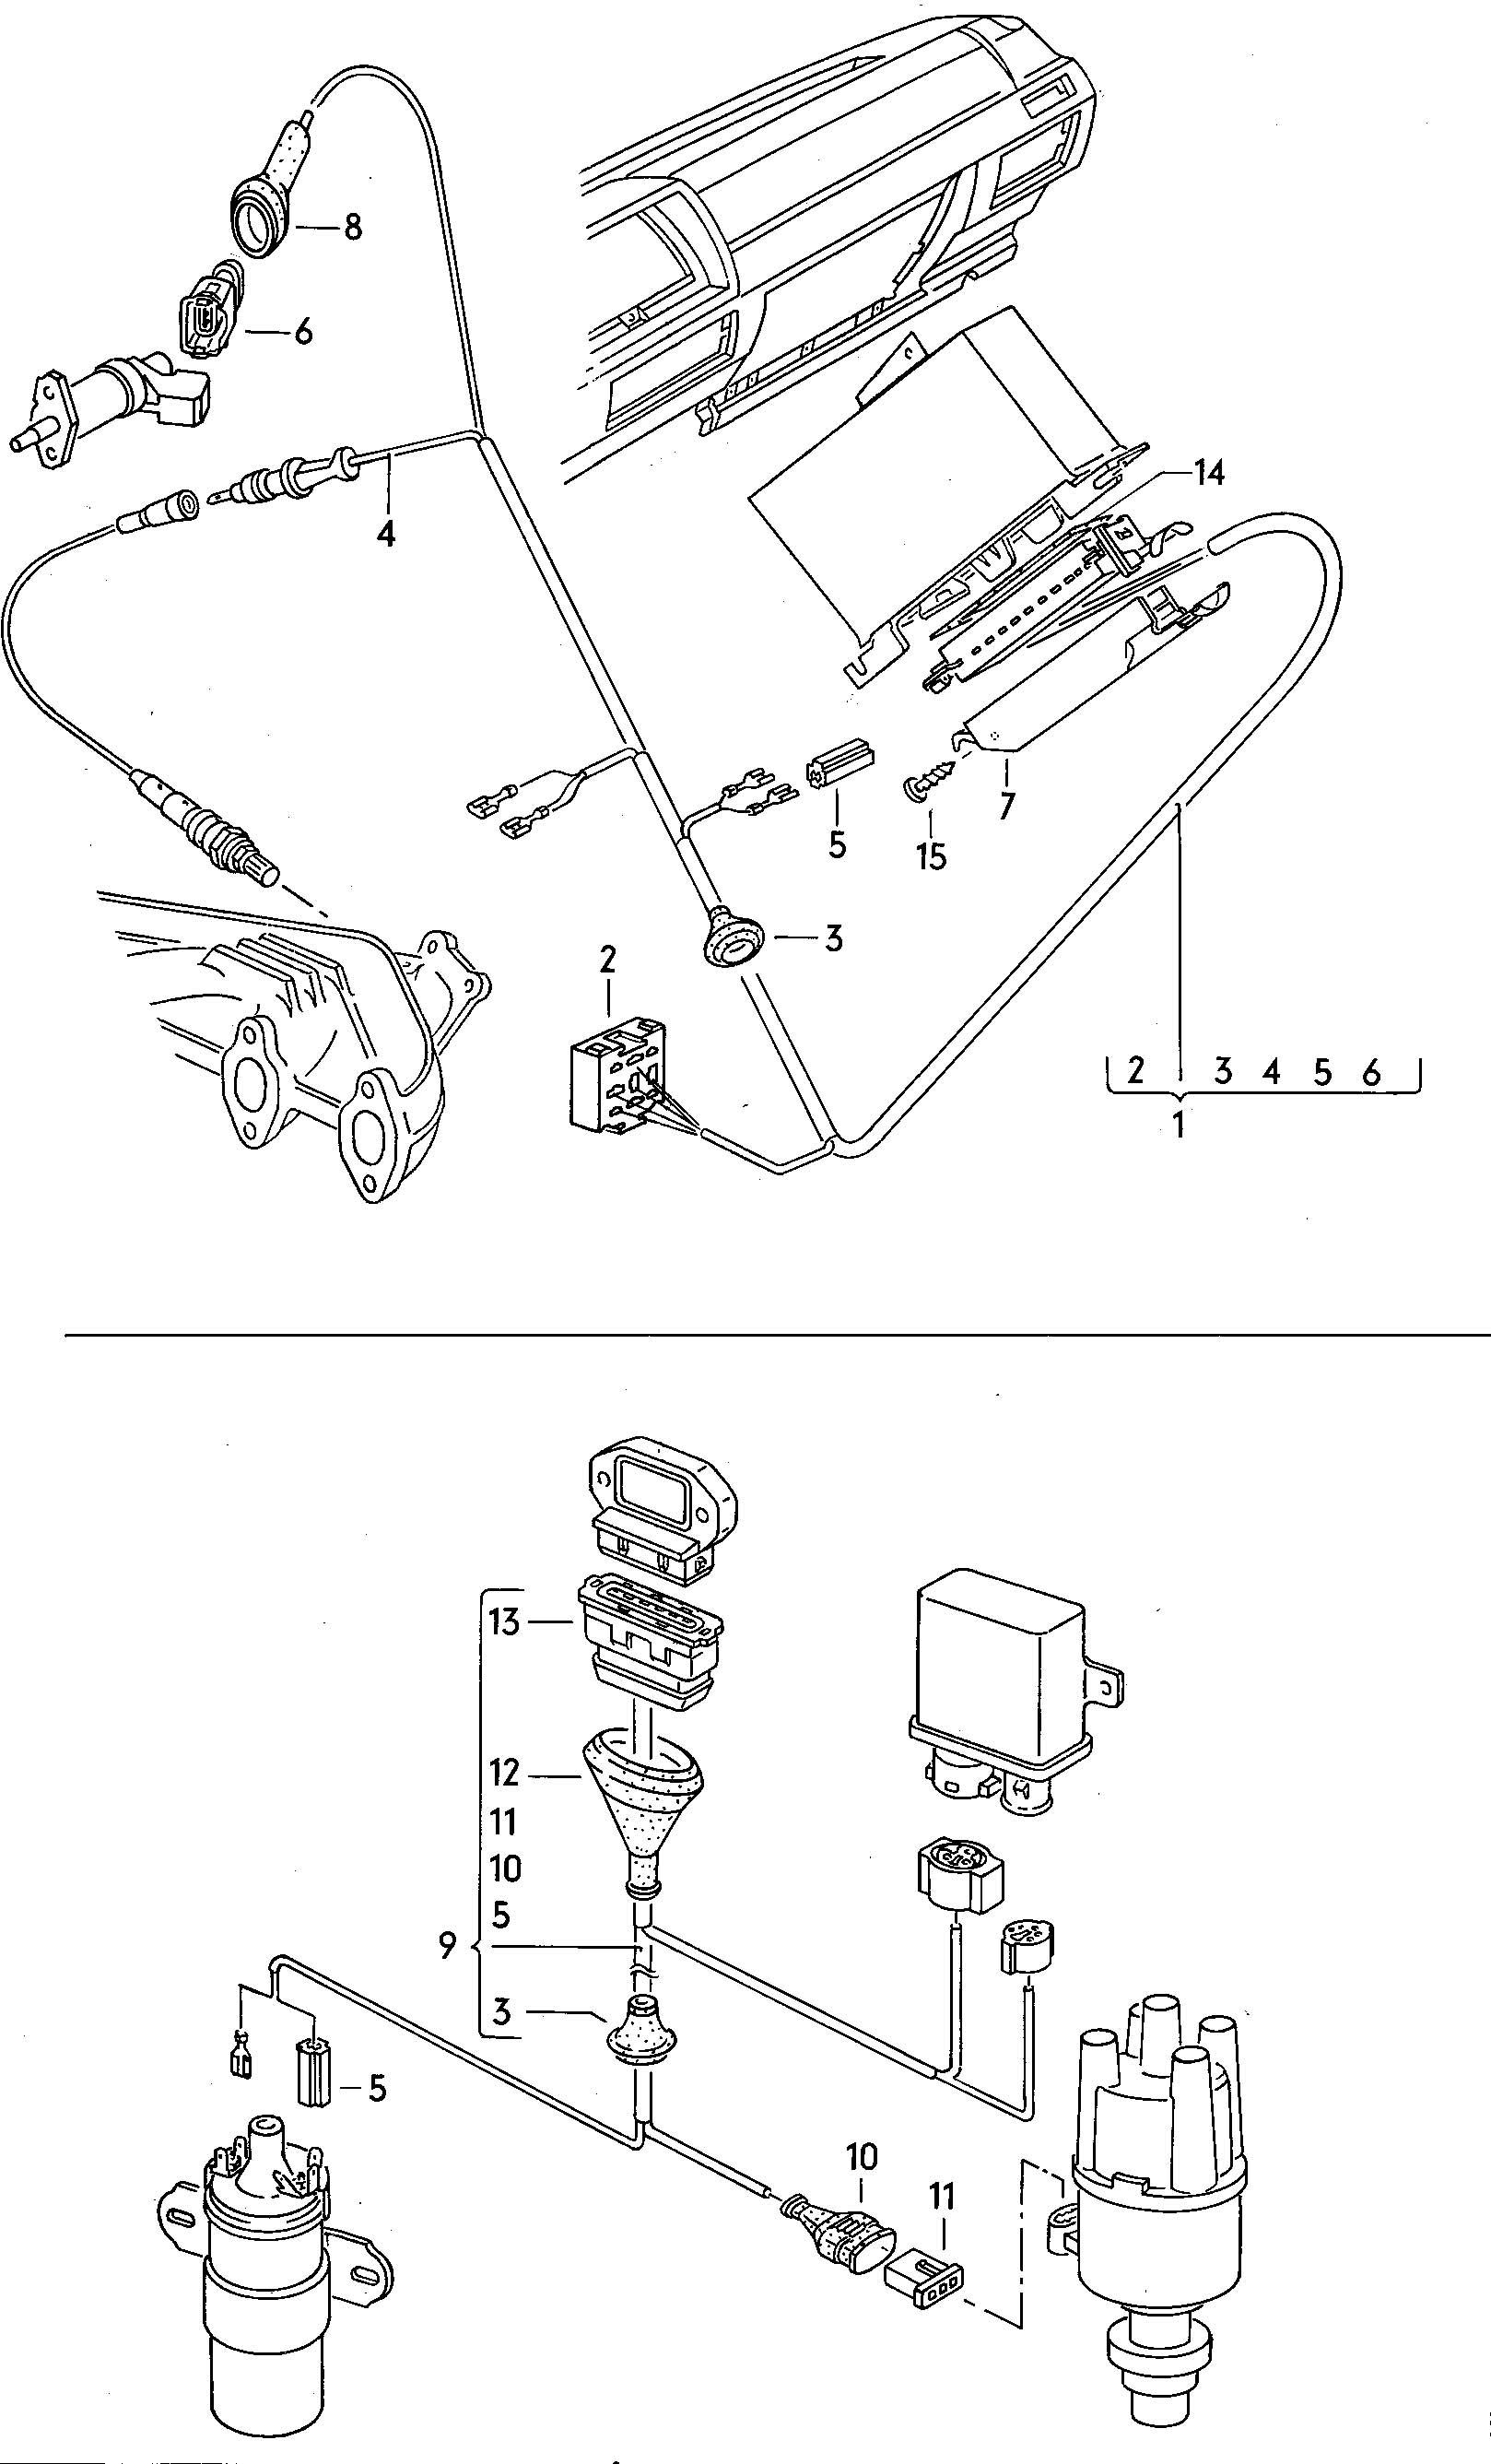 Volkswagen Vw Dasher Harness For Oxygen Sensor And Transistorized Ignition System